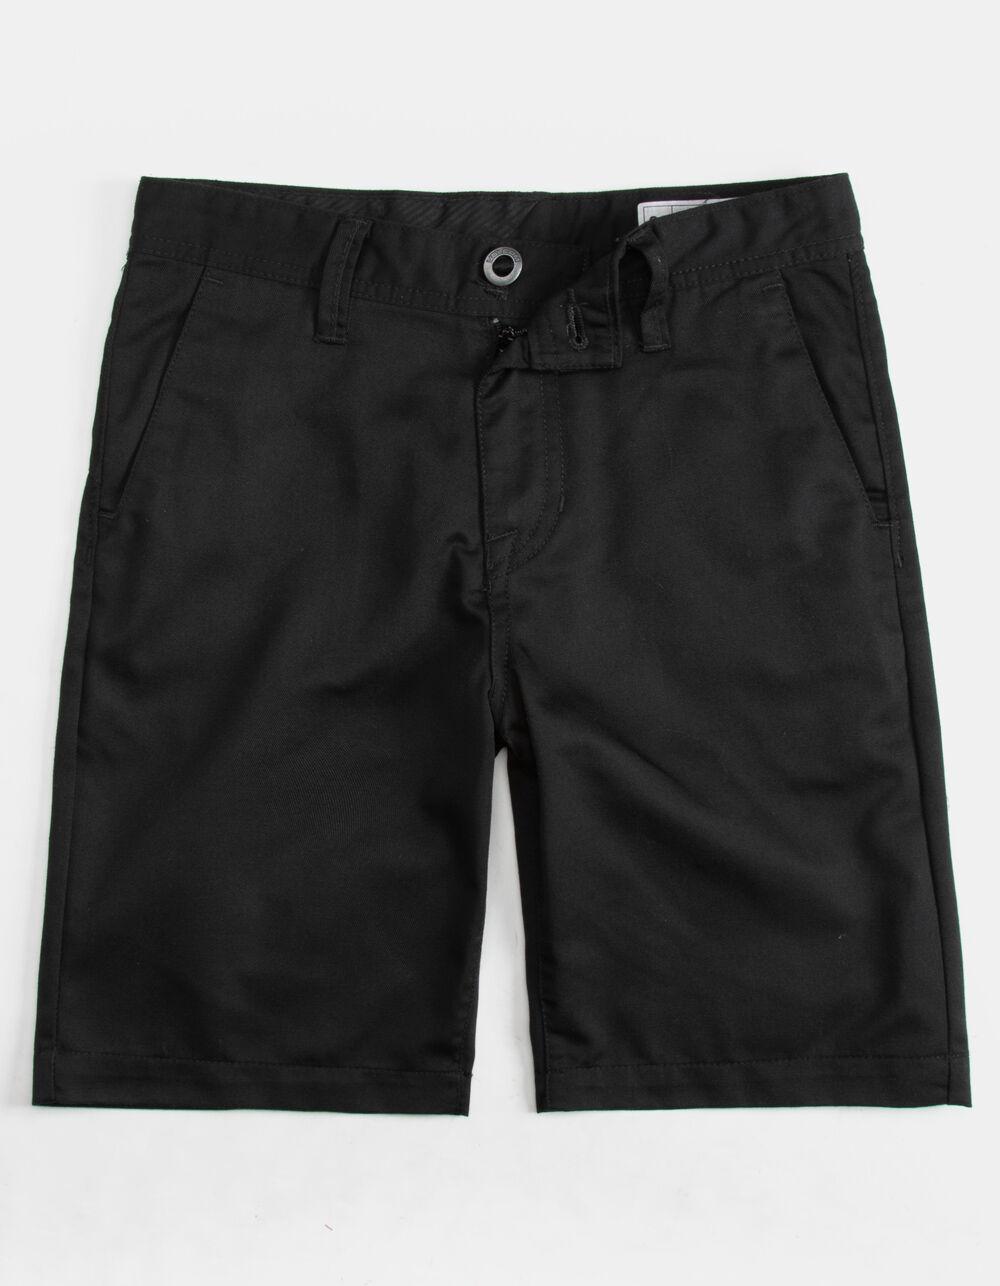 VOLCOM Frickin Chino Black Boys Shorts